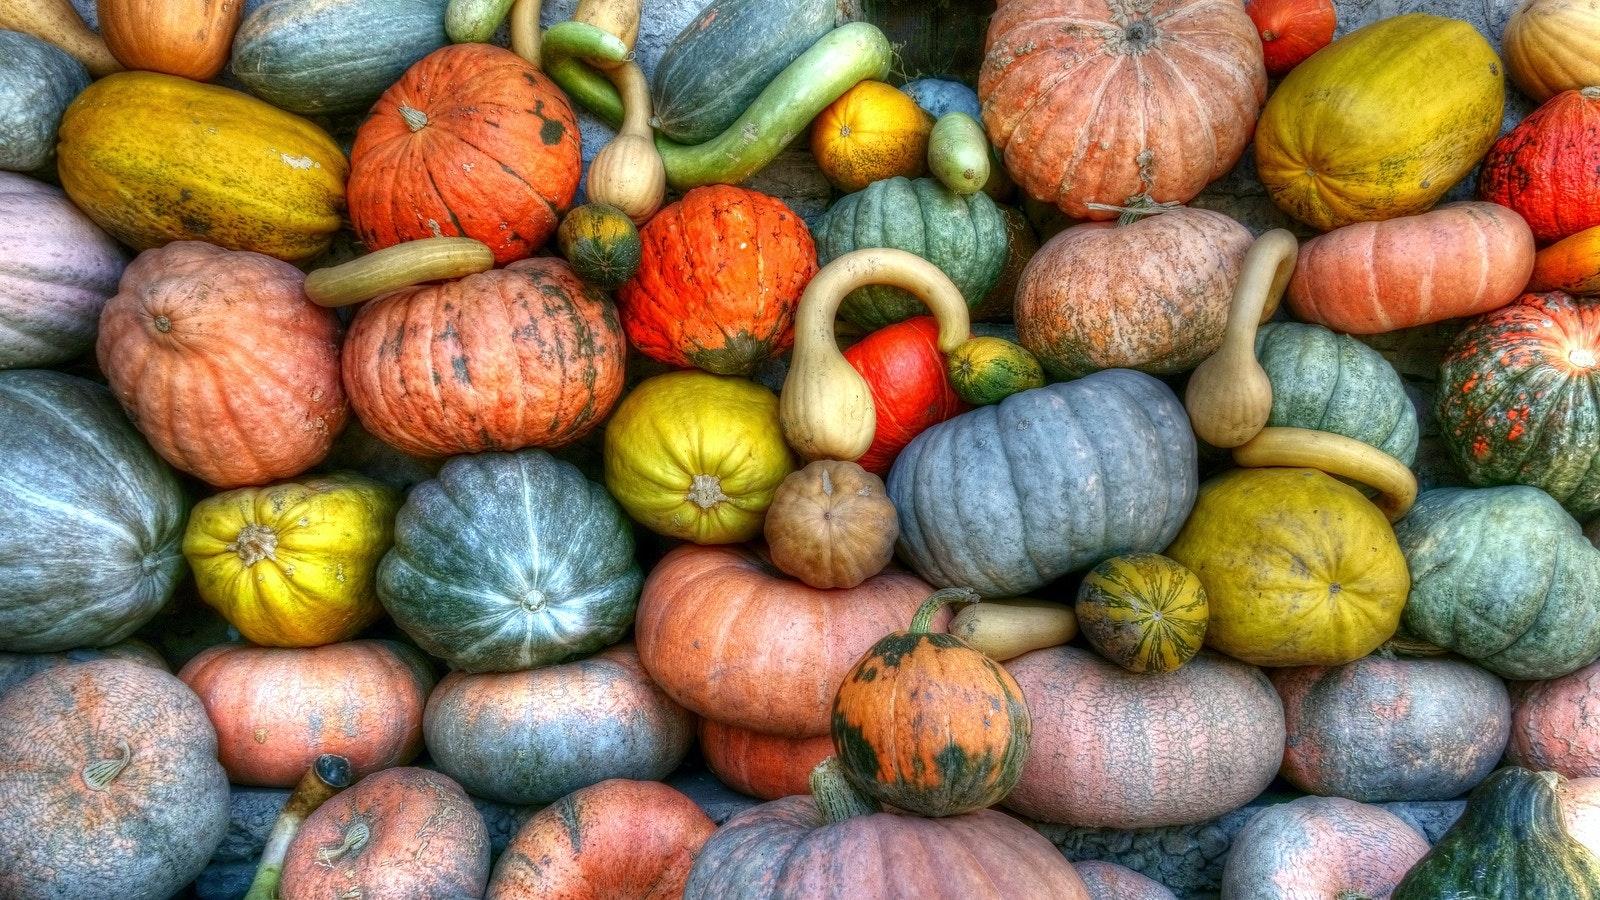 100 Amazing Pumpkin Photos Pexels Free Stock